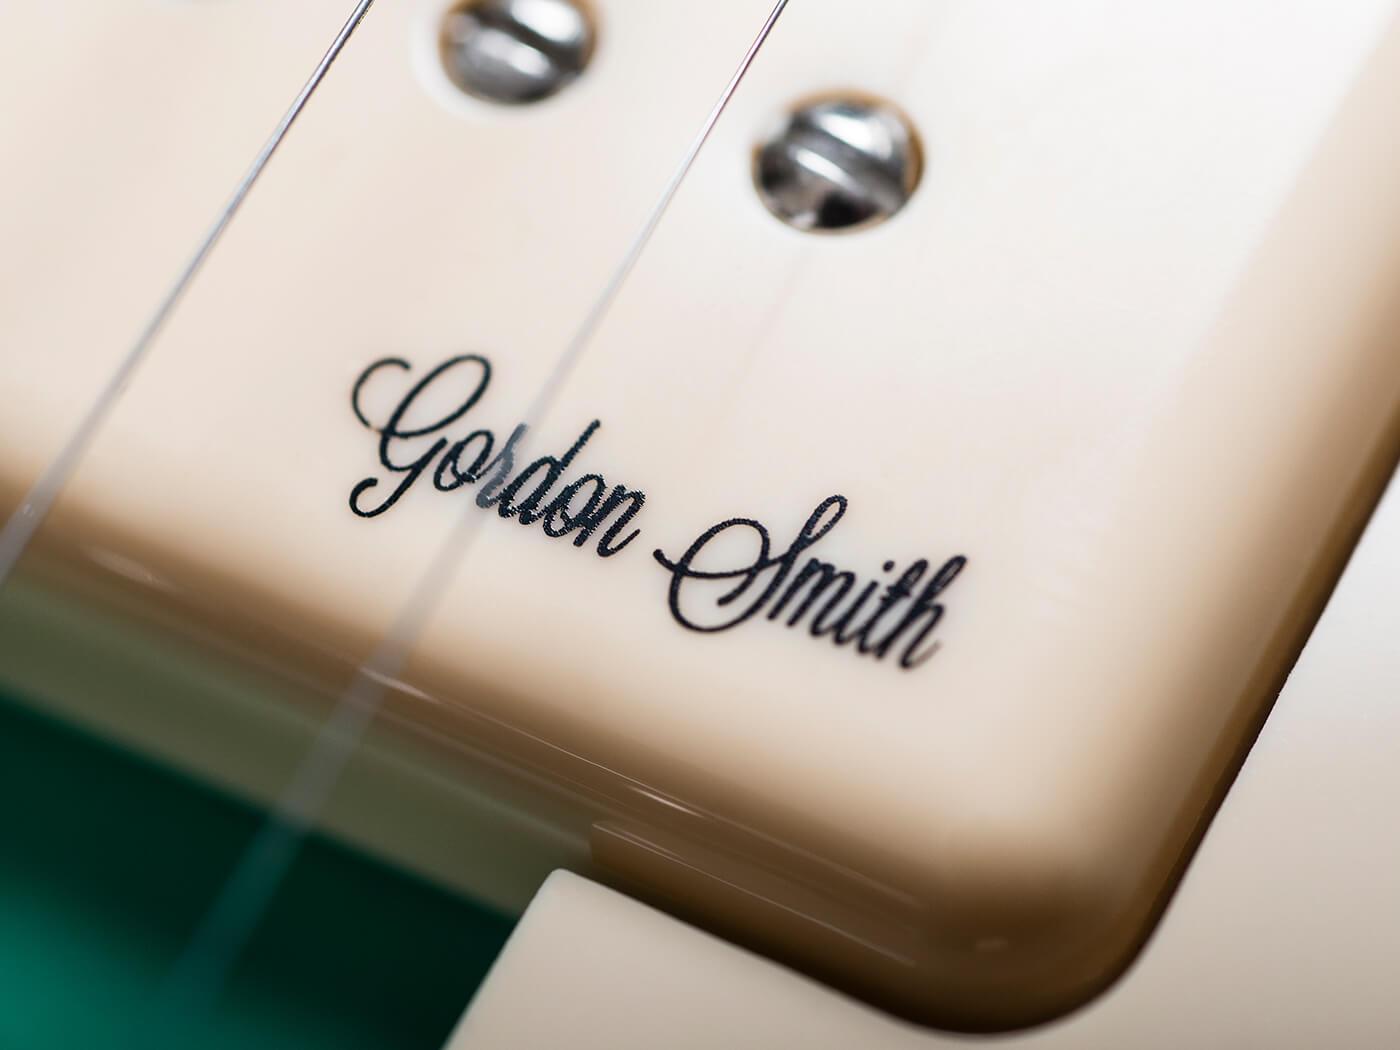 Gordon Smith GS-0 Special (Pickup)